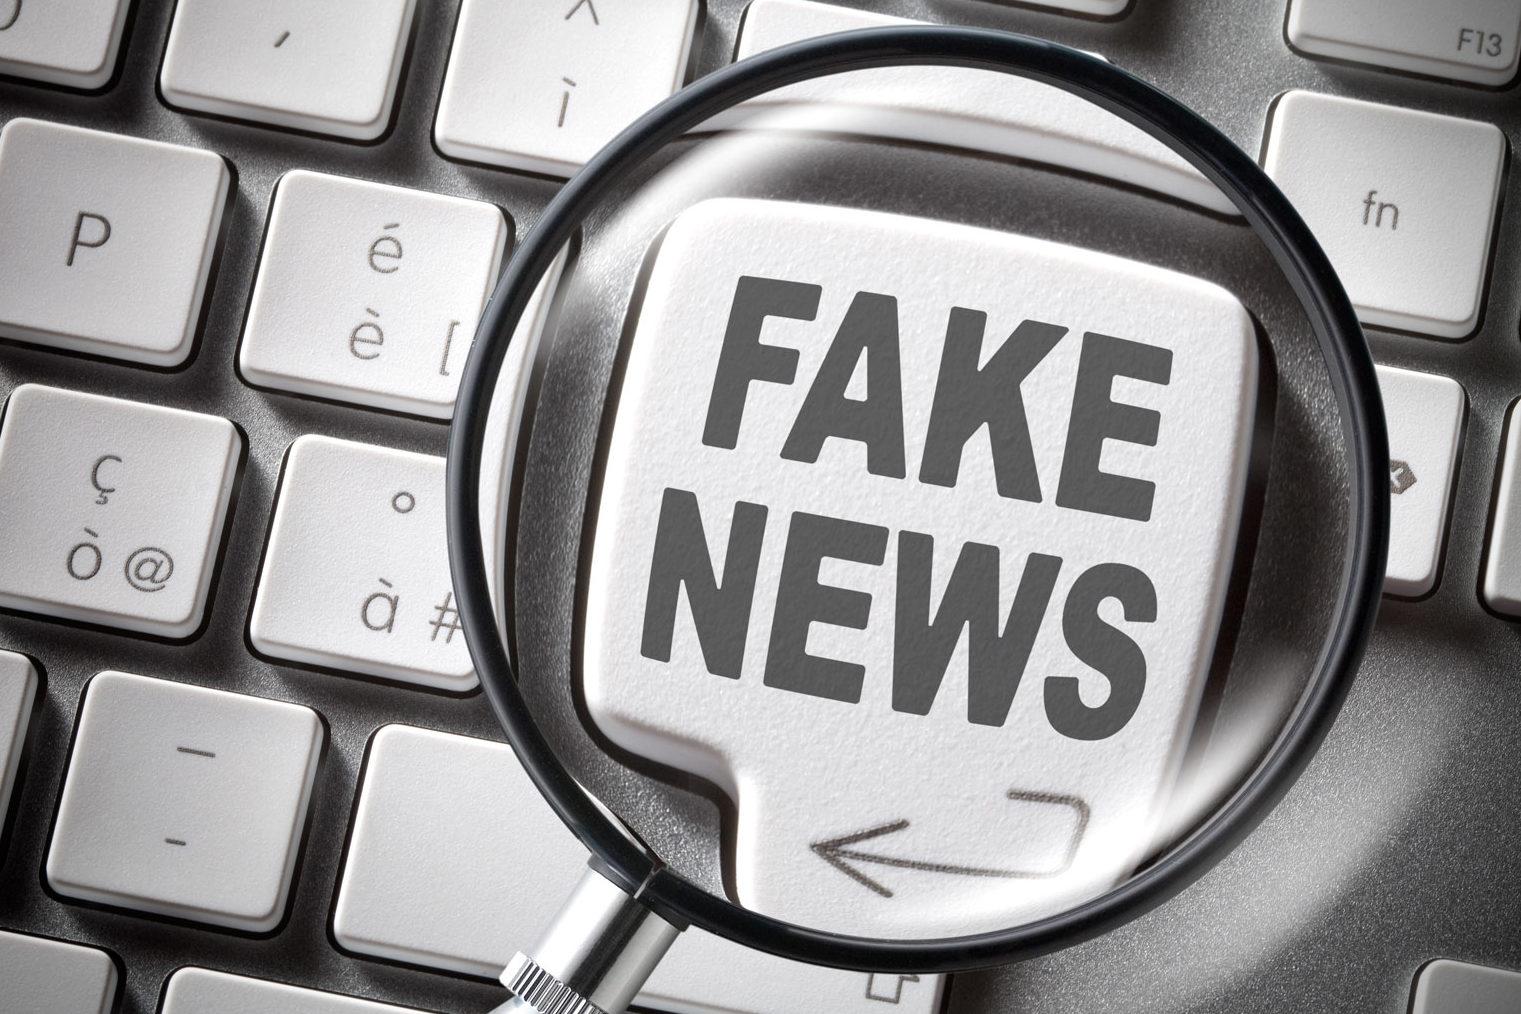 Fake news lente d'ingrandimento